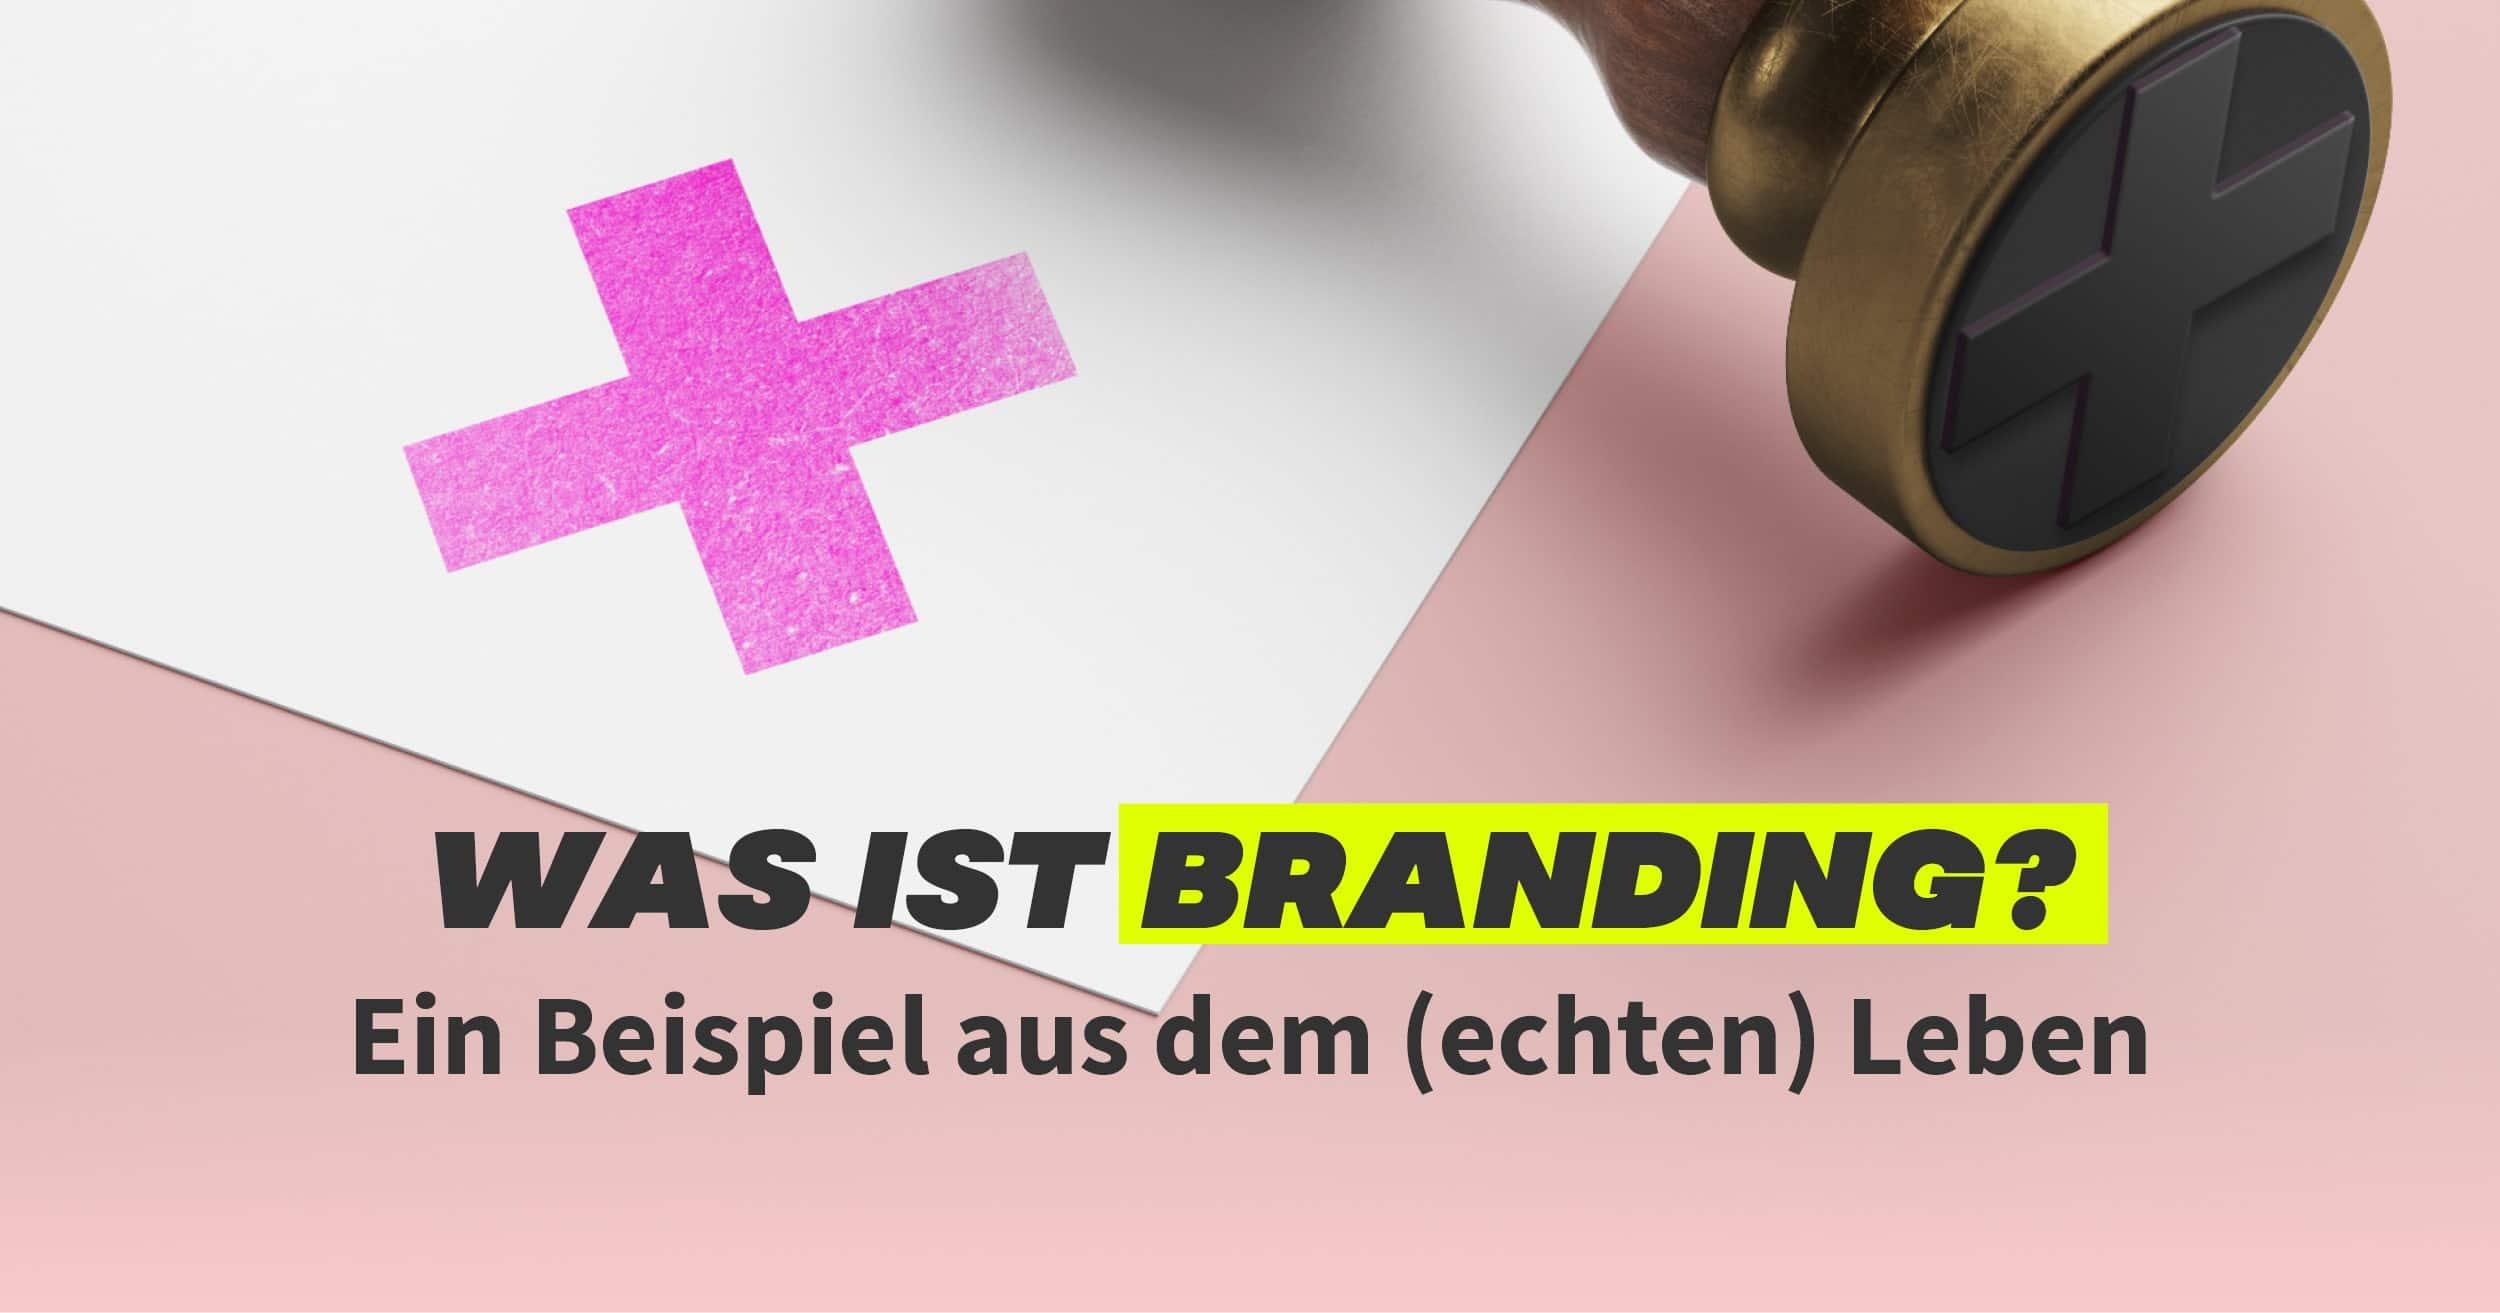 Was ist Branding?